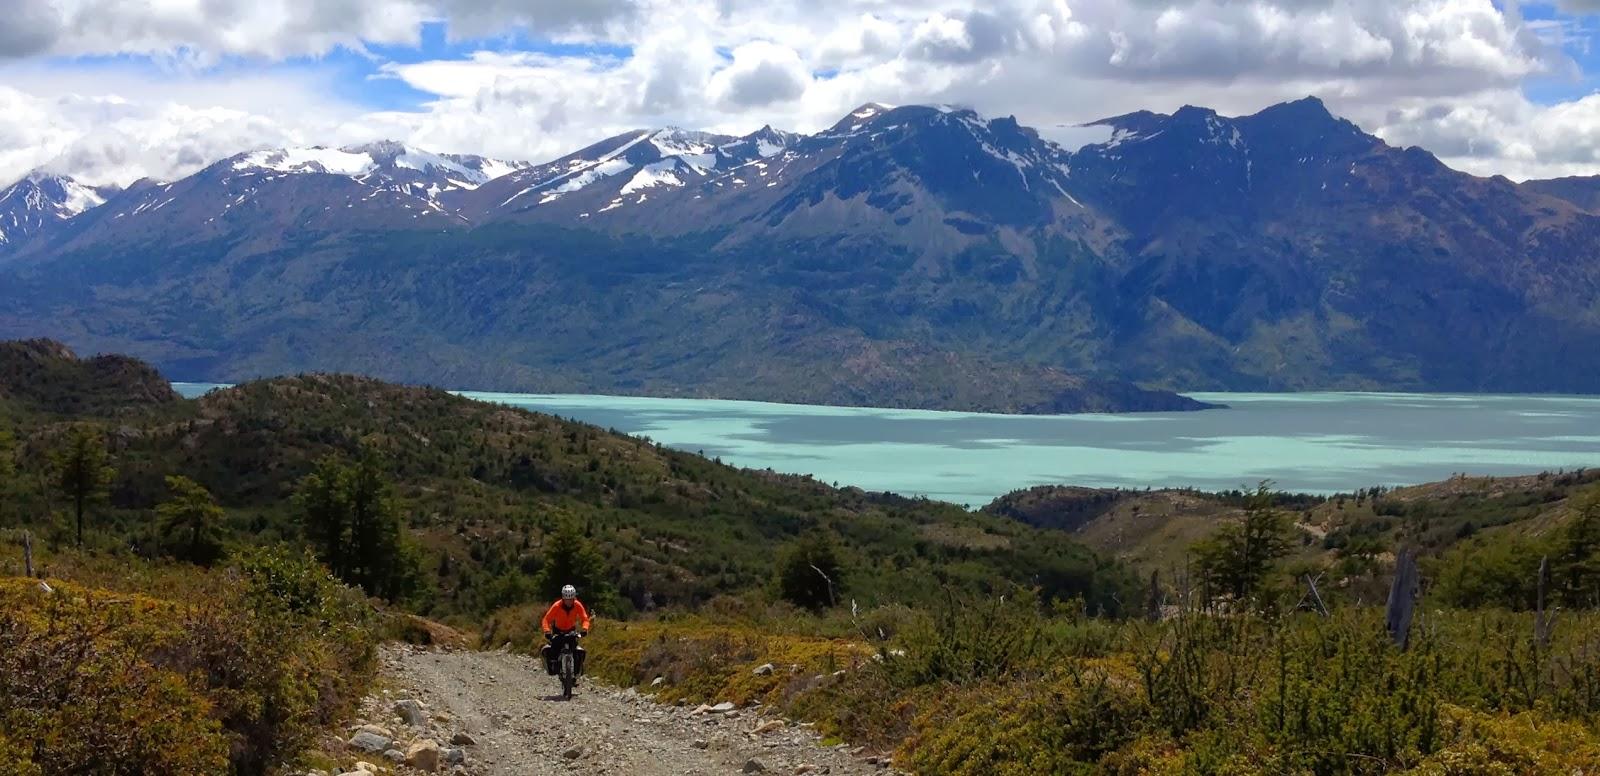 Велосипедист и пейзажи Патагонии